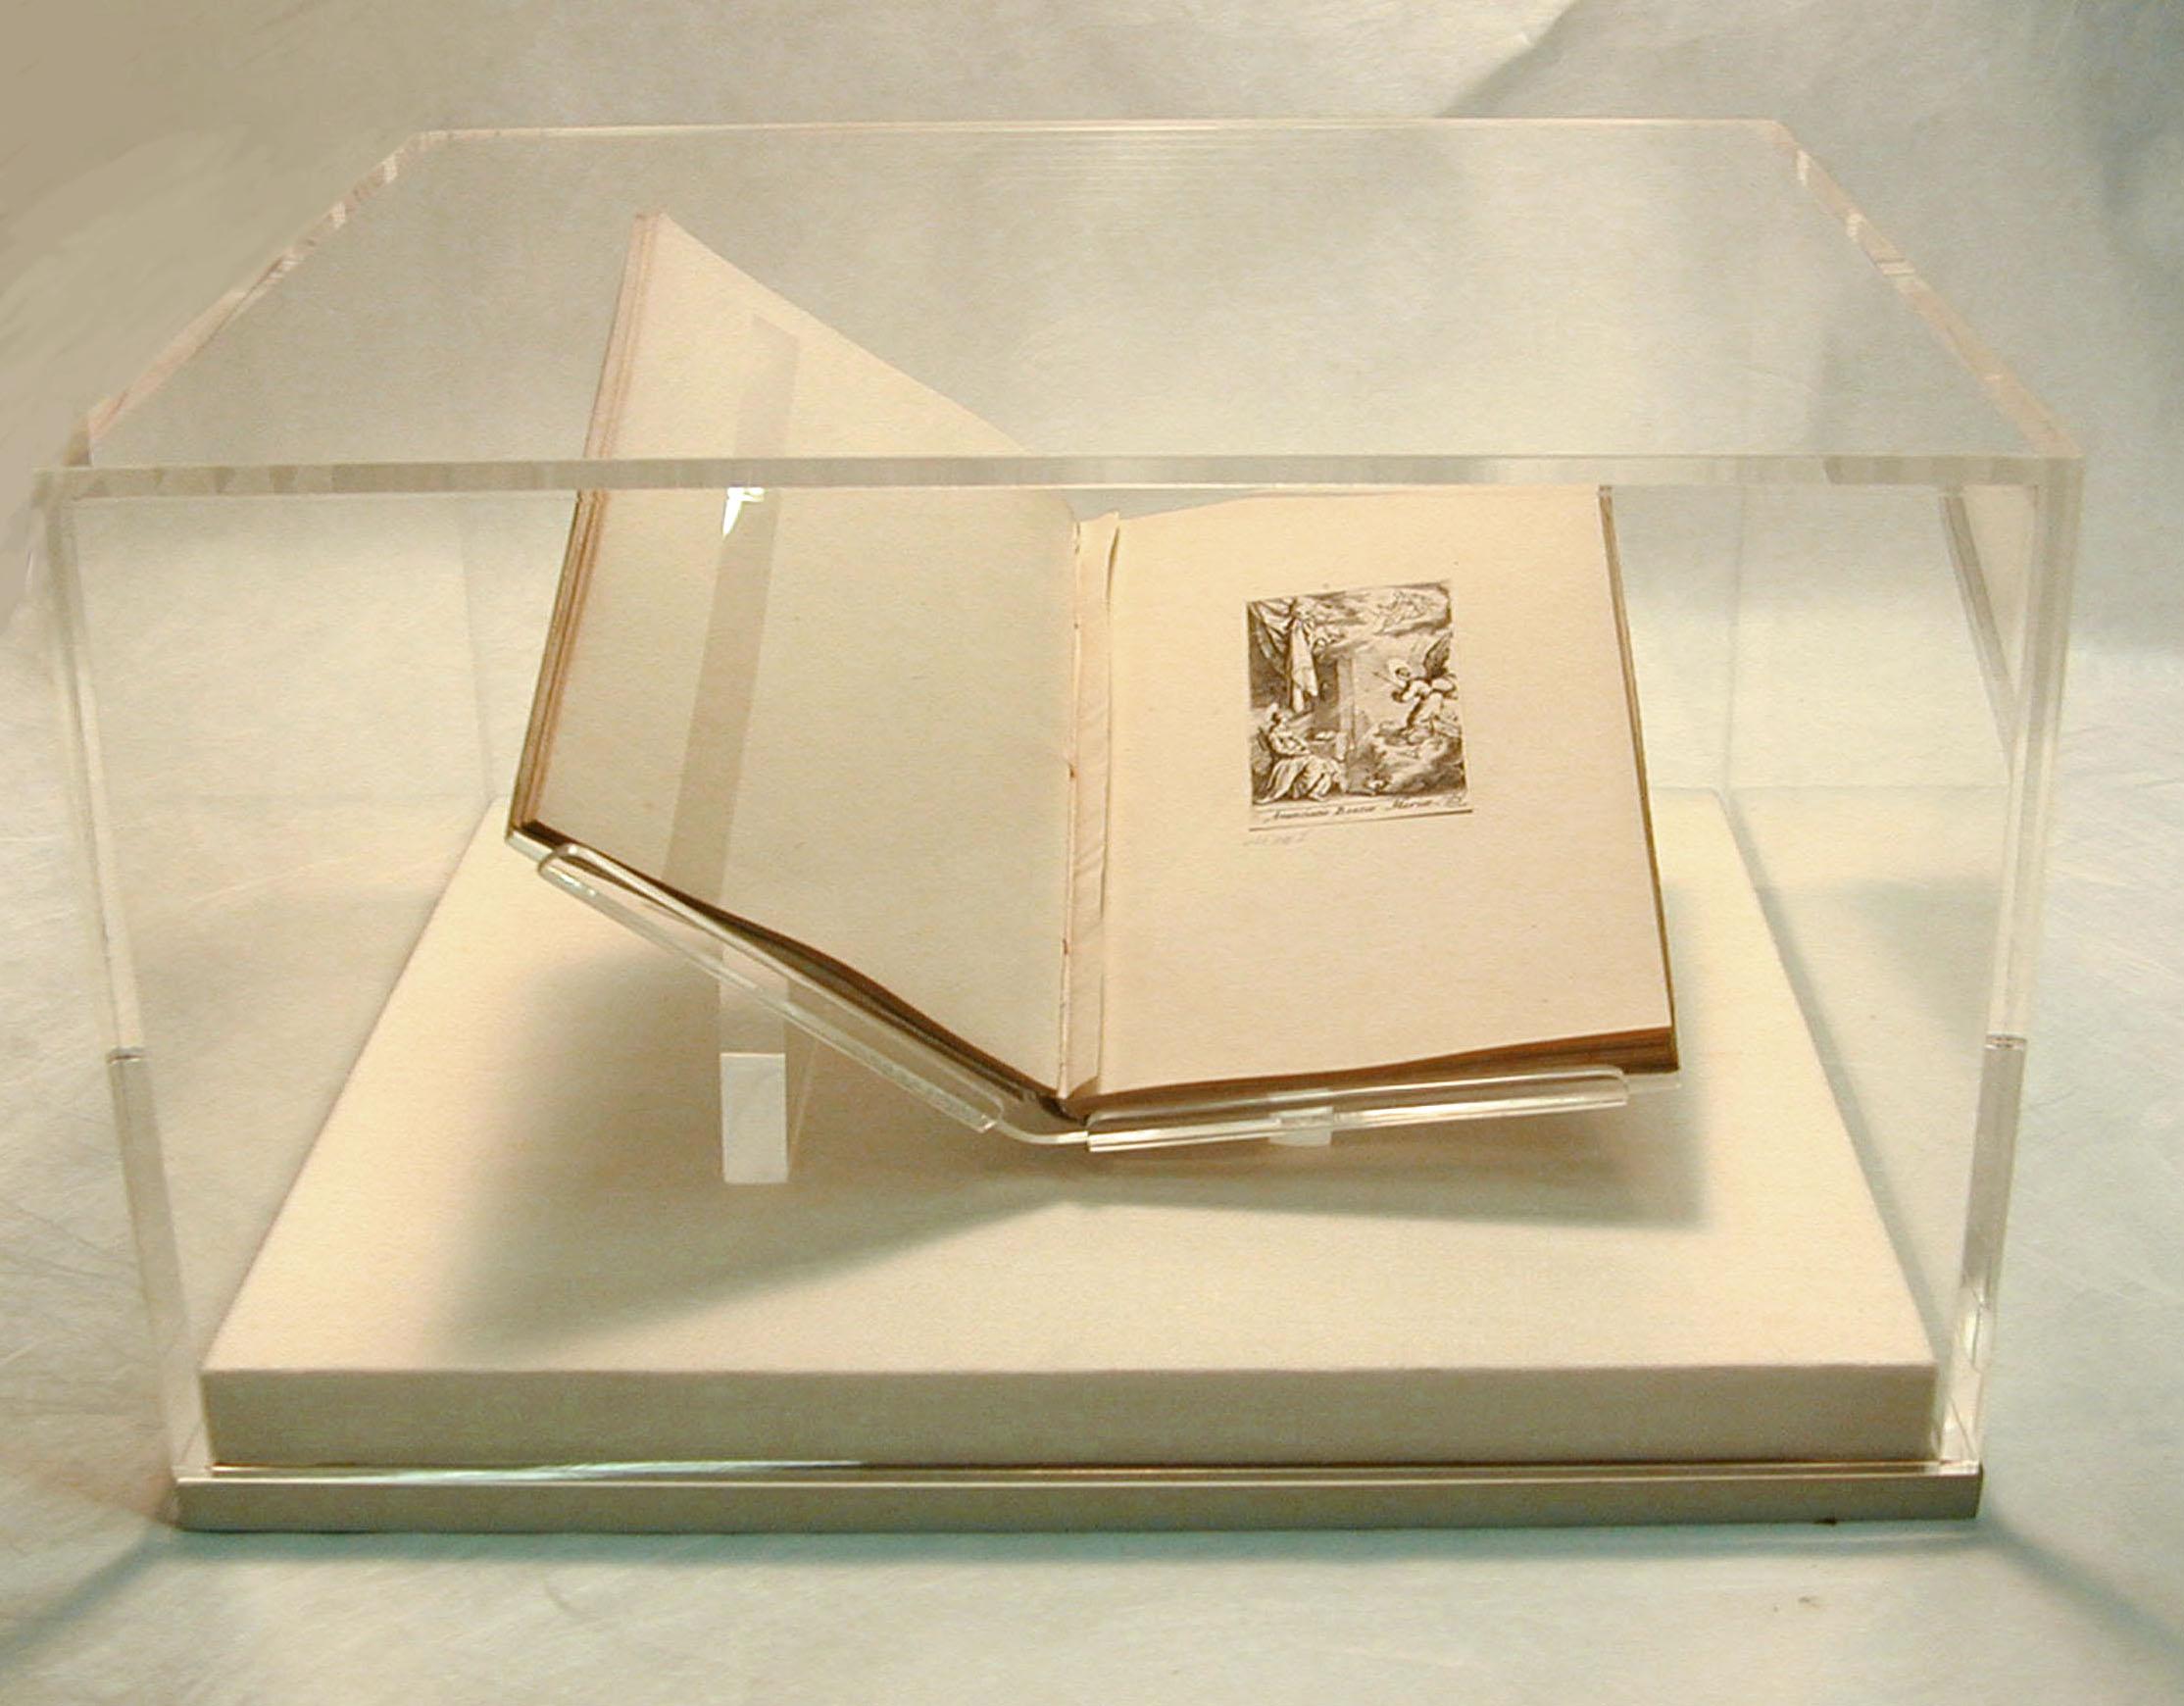 Custom Acrylic Book Cradle